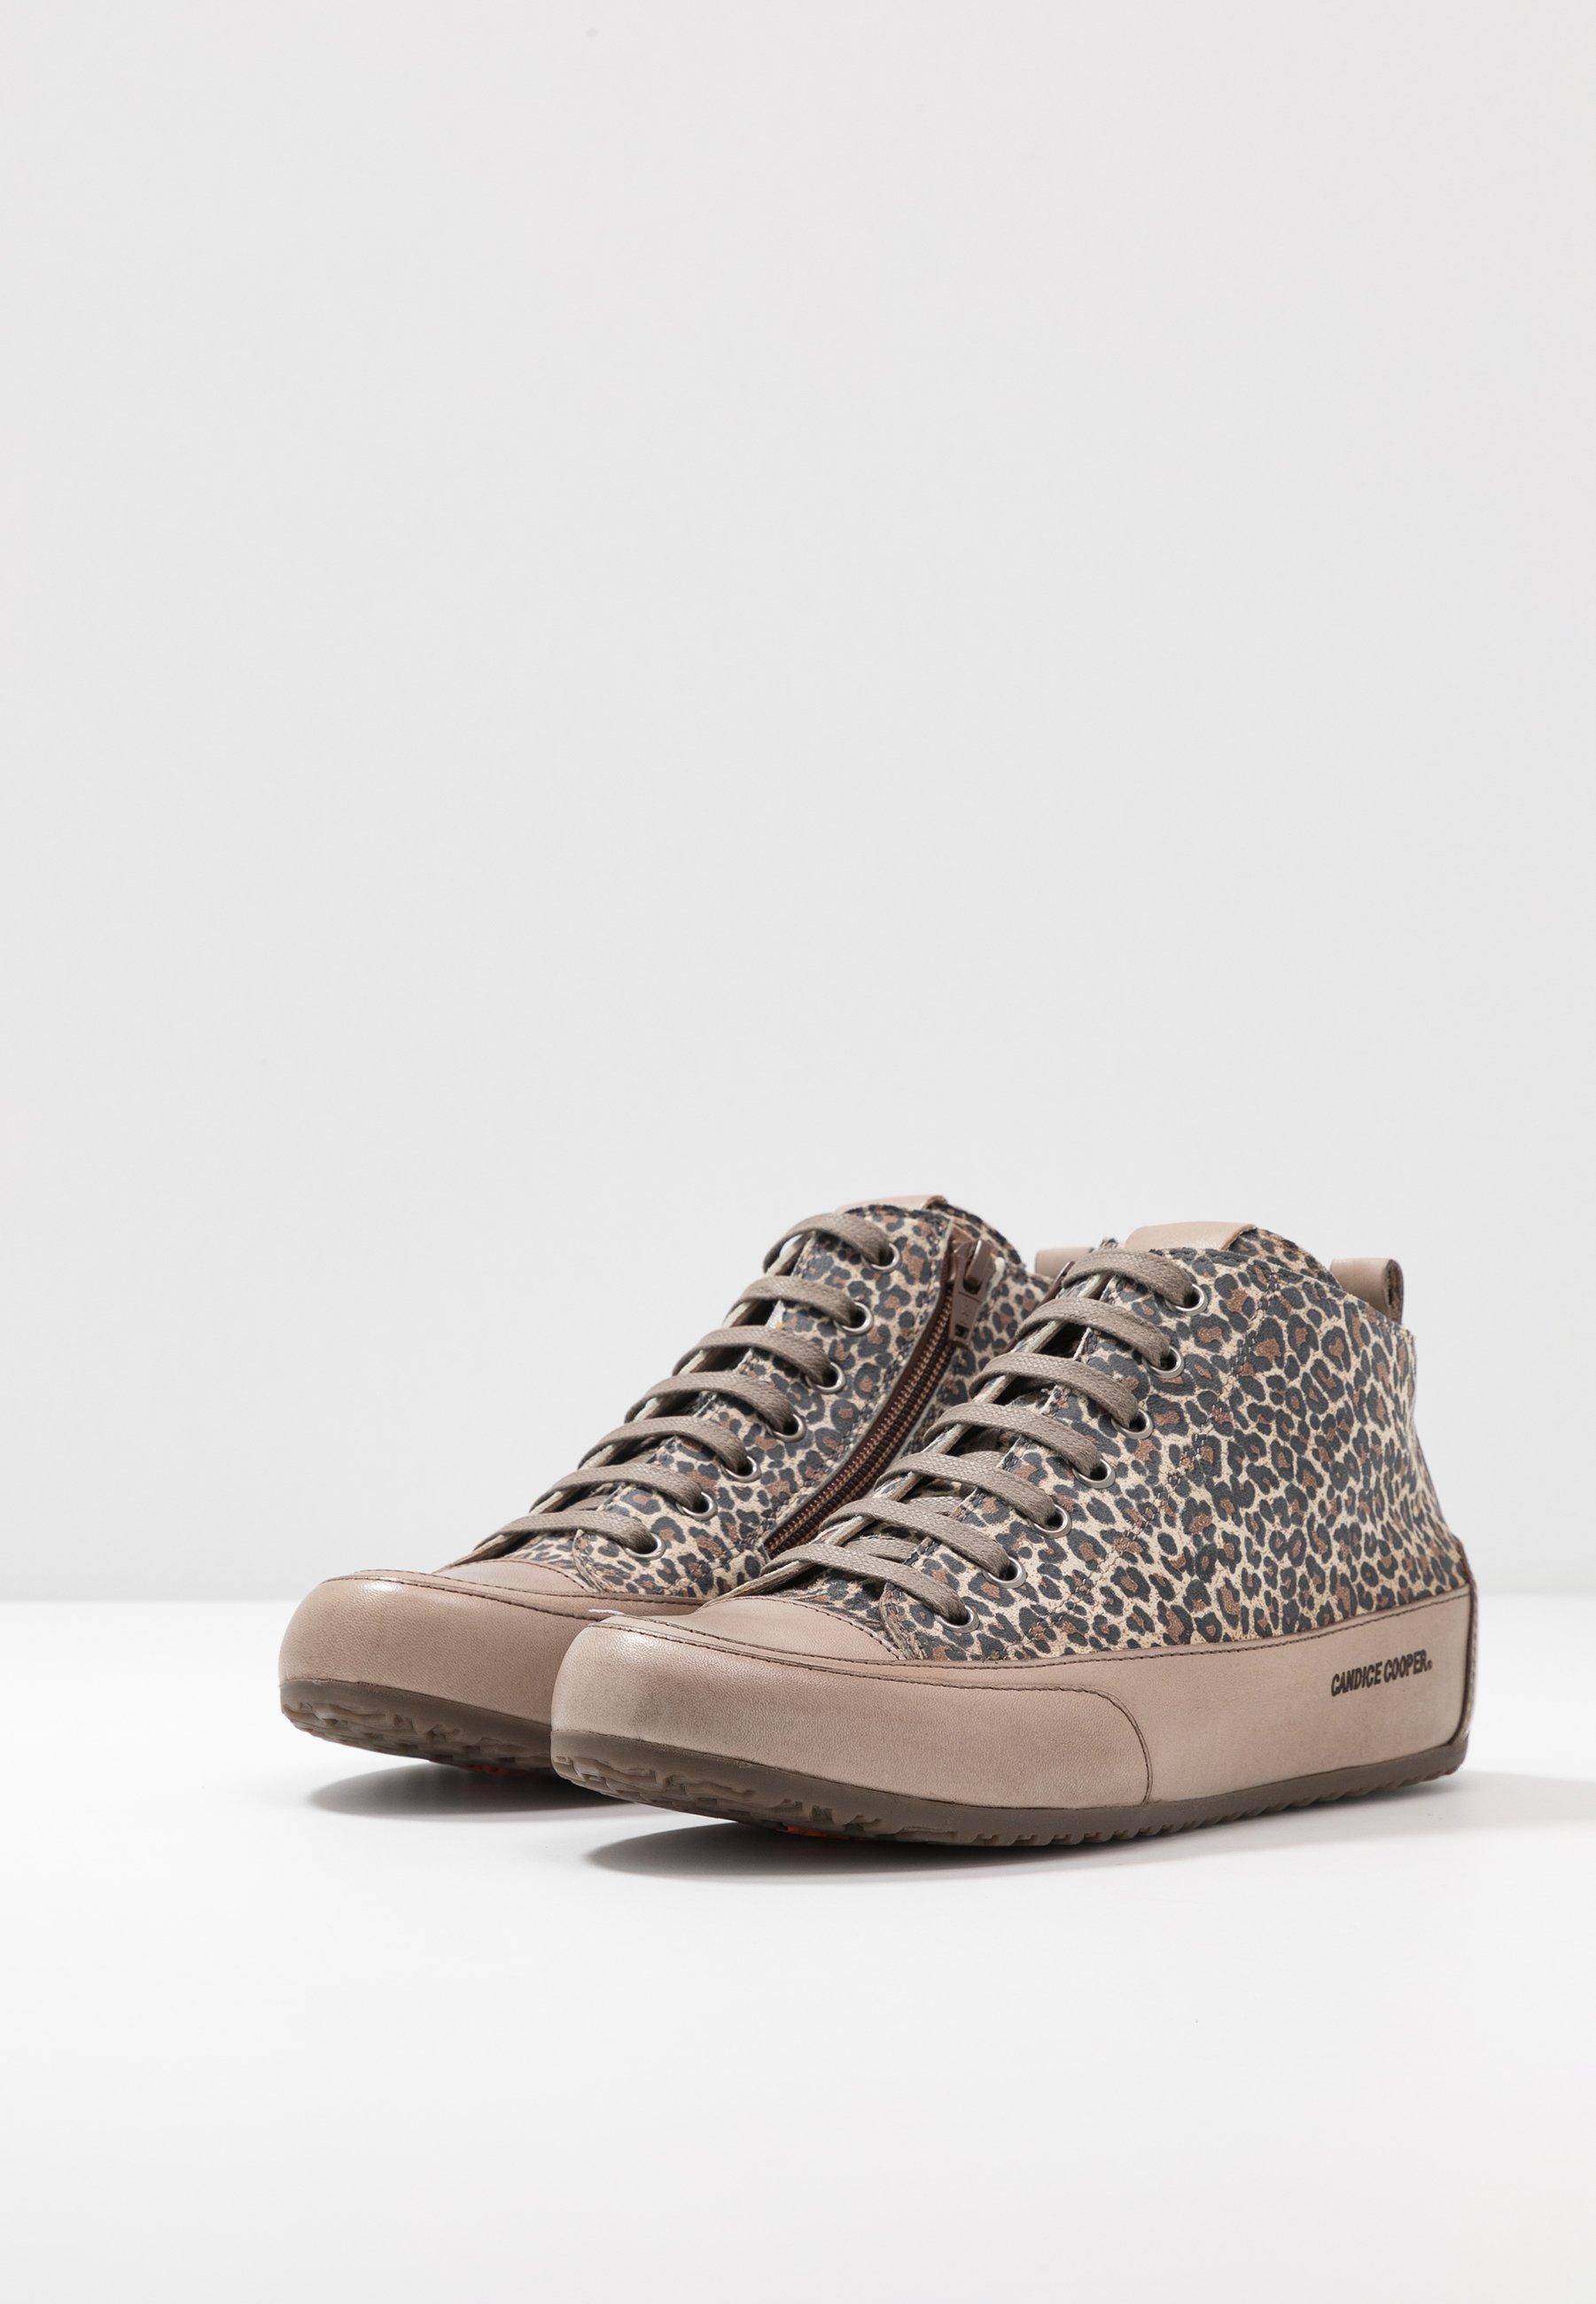 Candice Cooper MID Sneaker high stone/beige